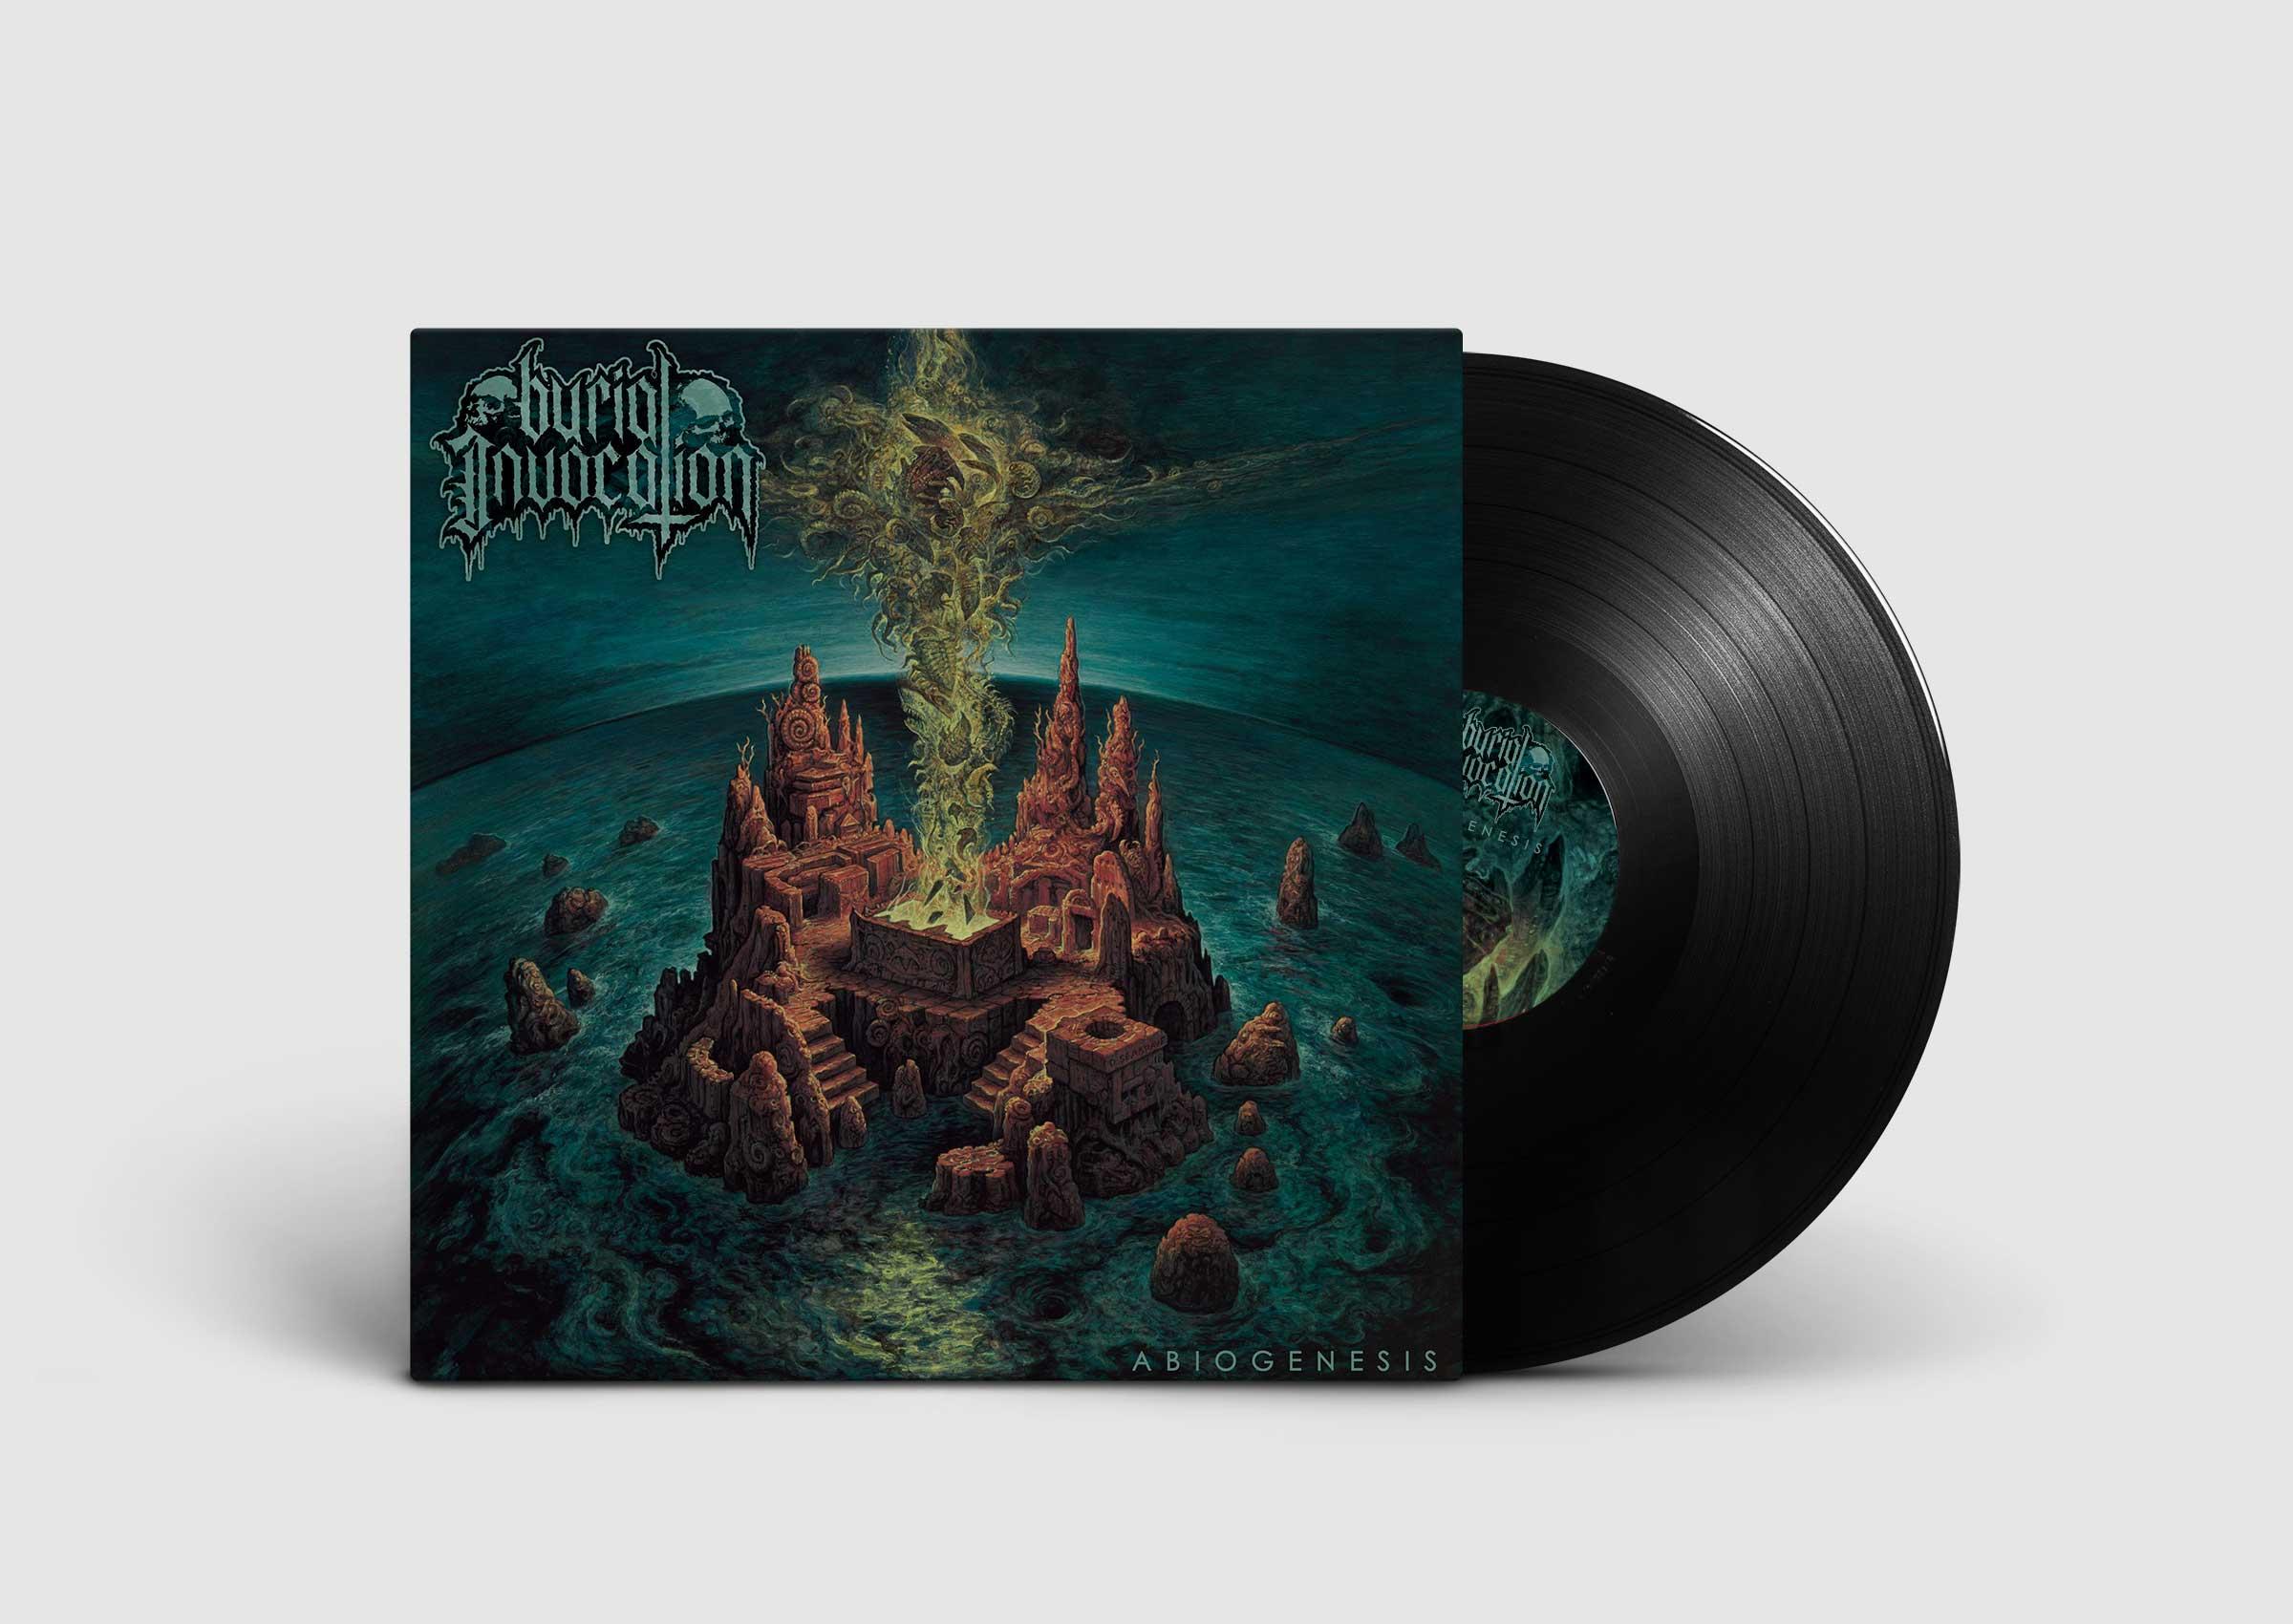 Burial Invocation Abiogenesis vinyl